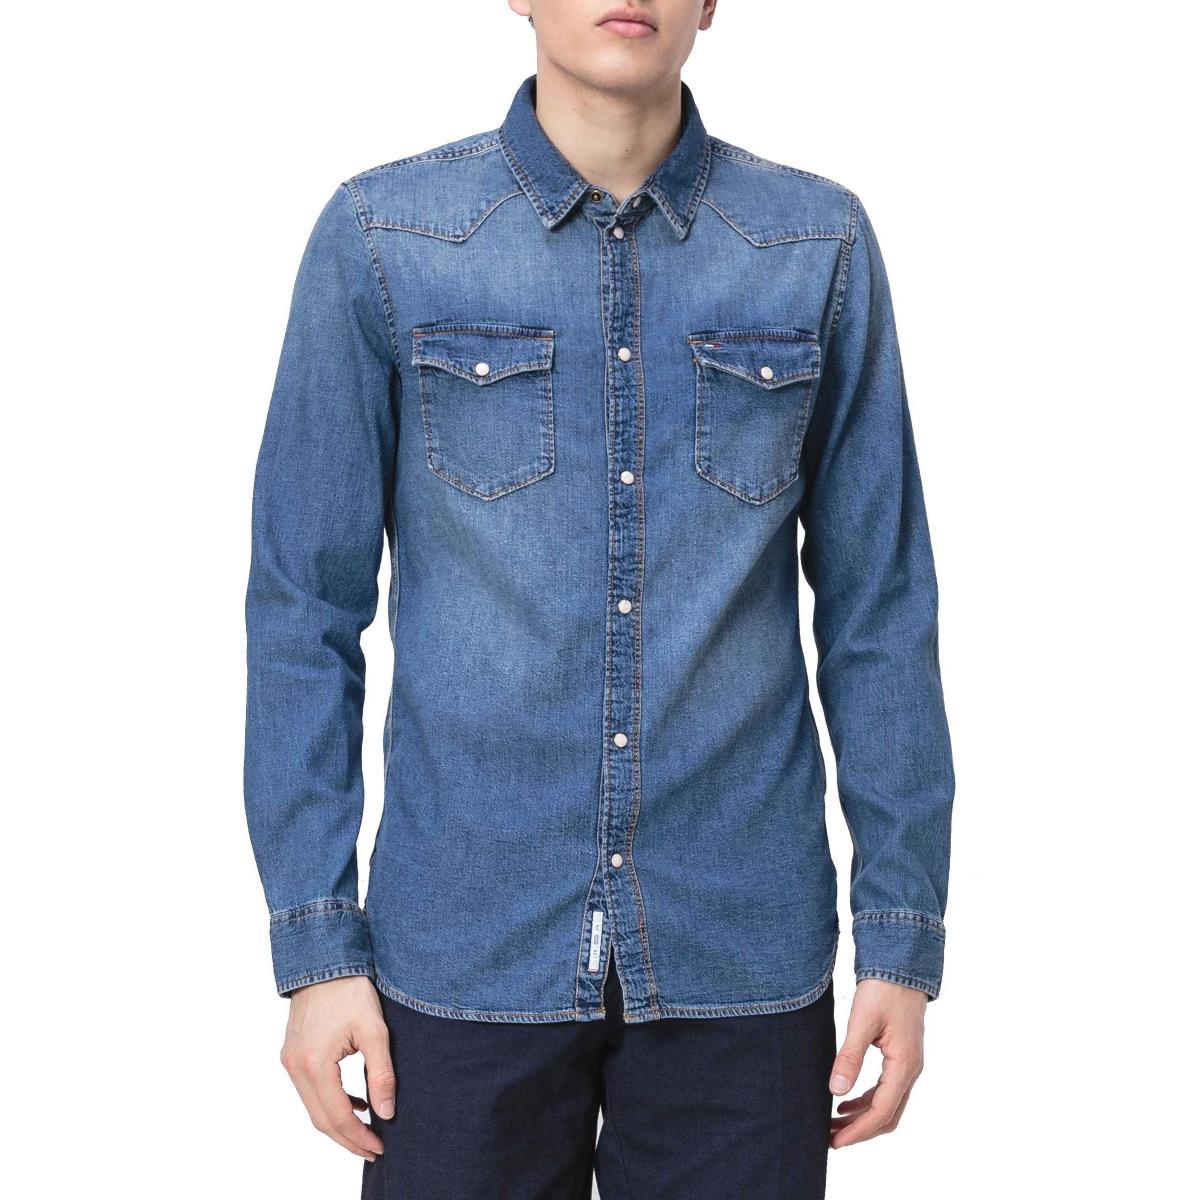 Camicia Tommy Jeans Western denim da uomo rif. DM0DM06155